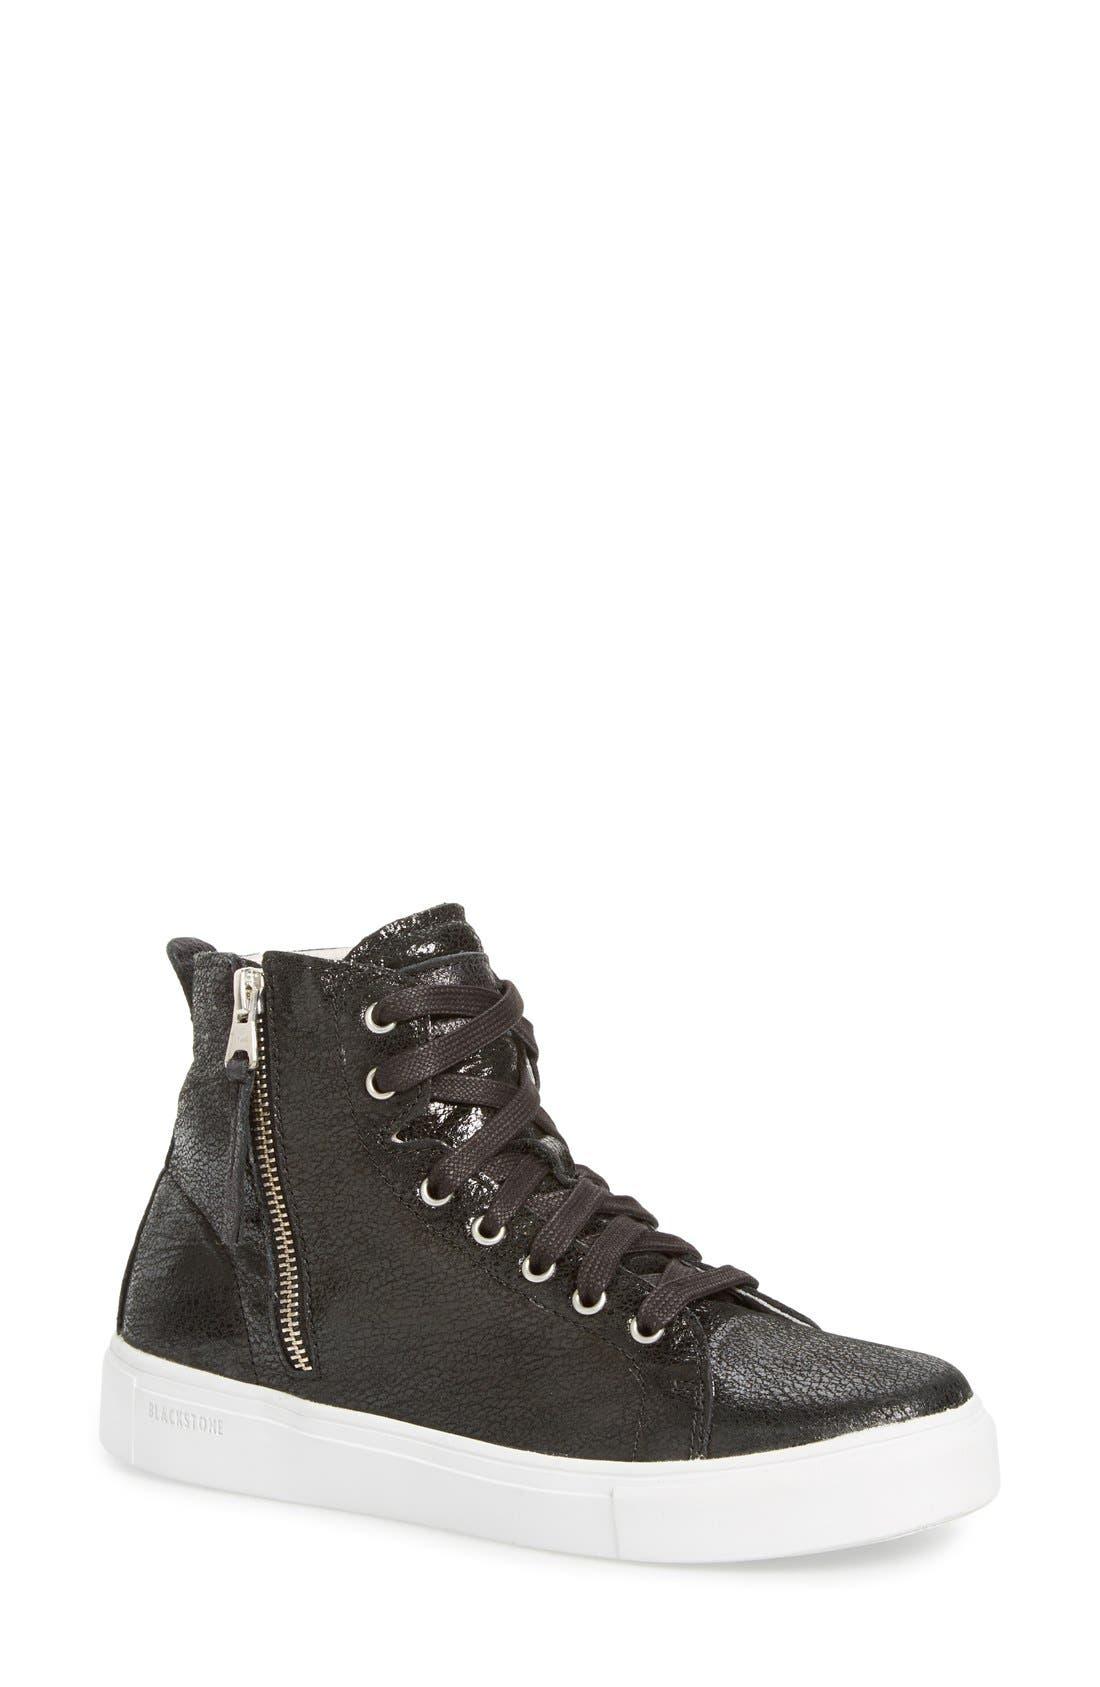 Alternate Image 1 Selected - Blackstone 'LL65' High Top Sneaker (Women)